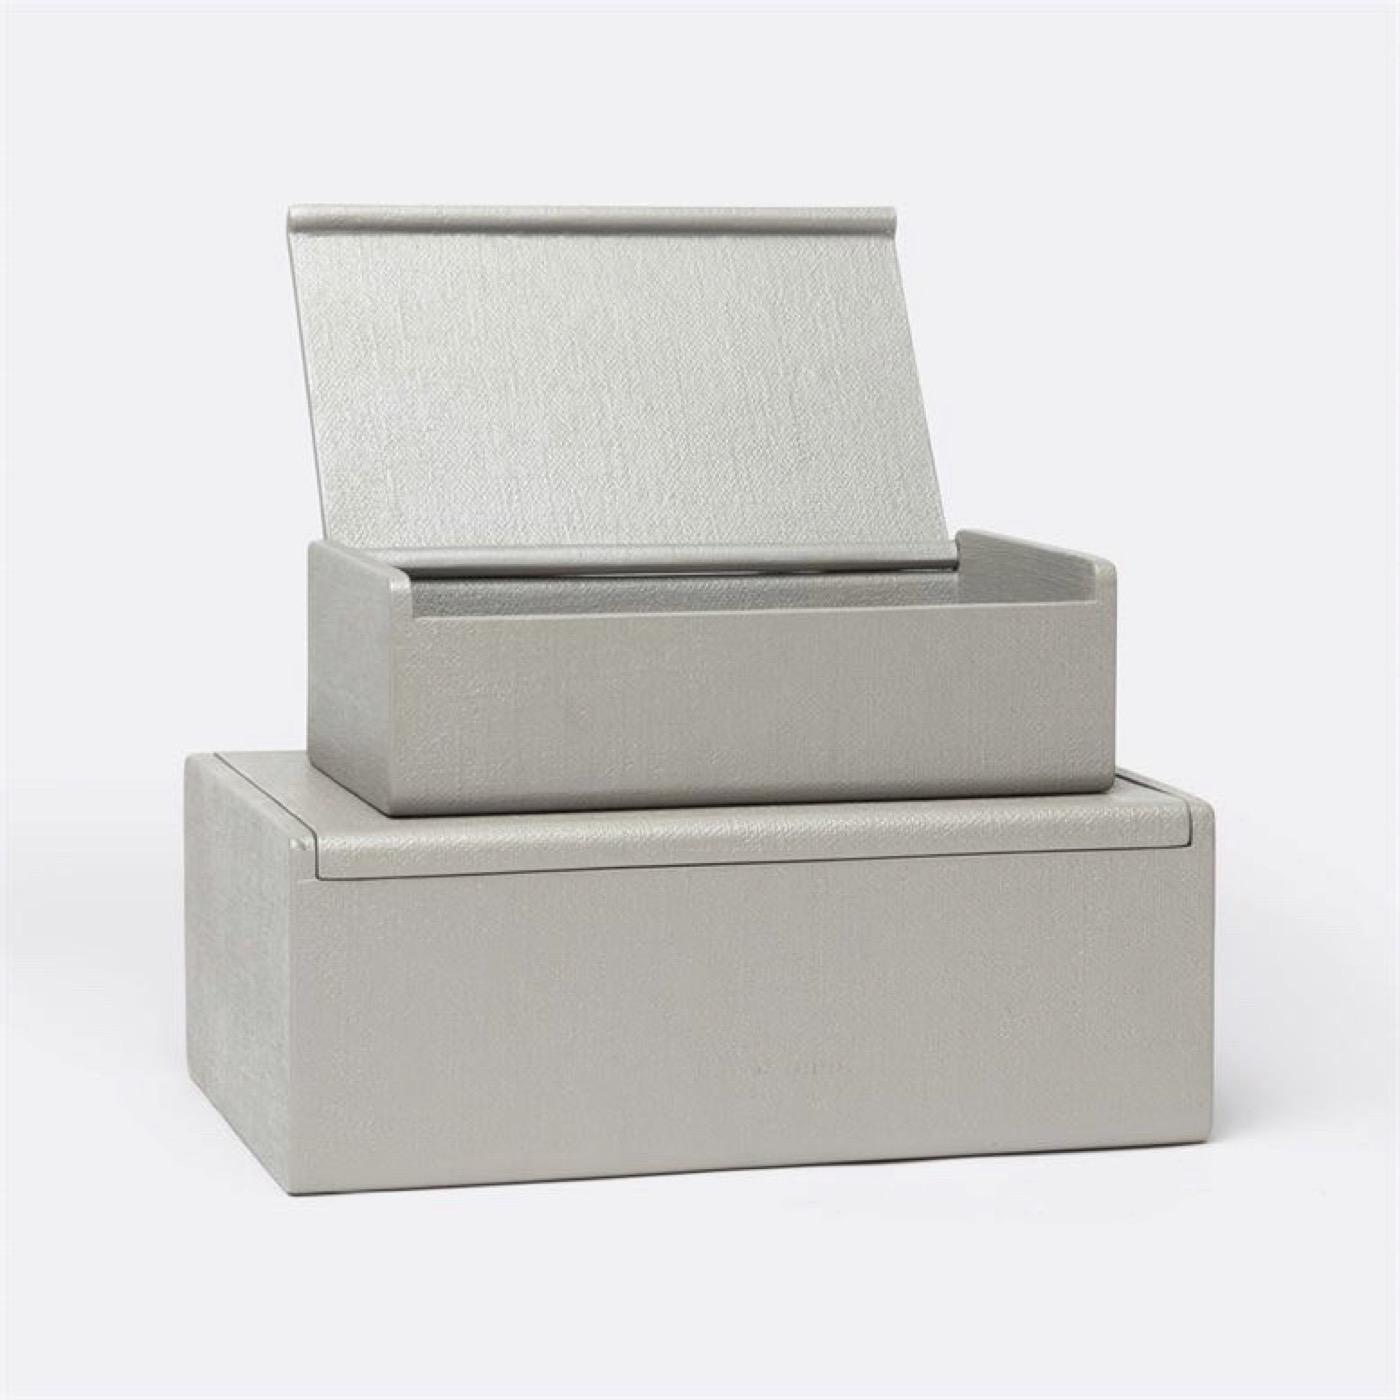 "Doris ""Linen"" Boxes Set | Grey"